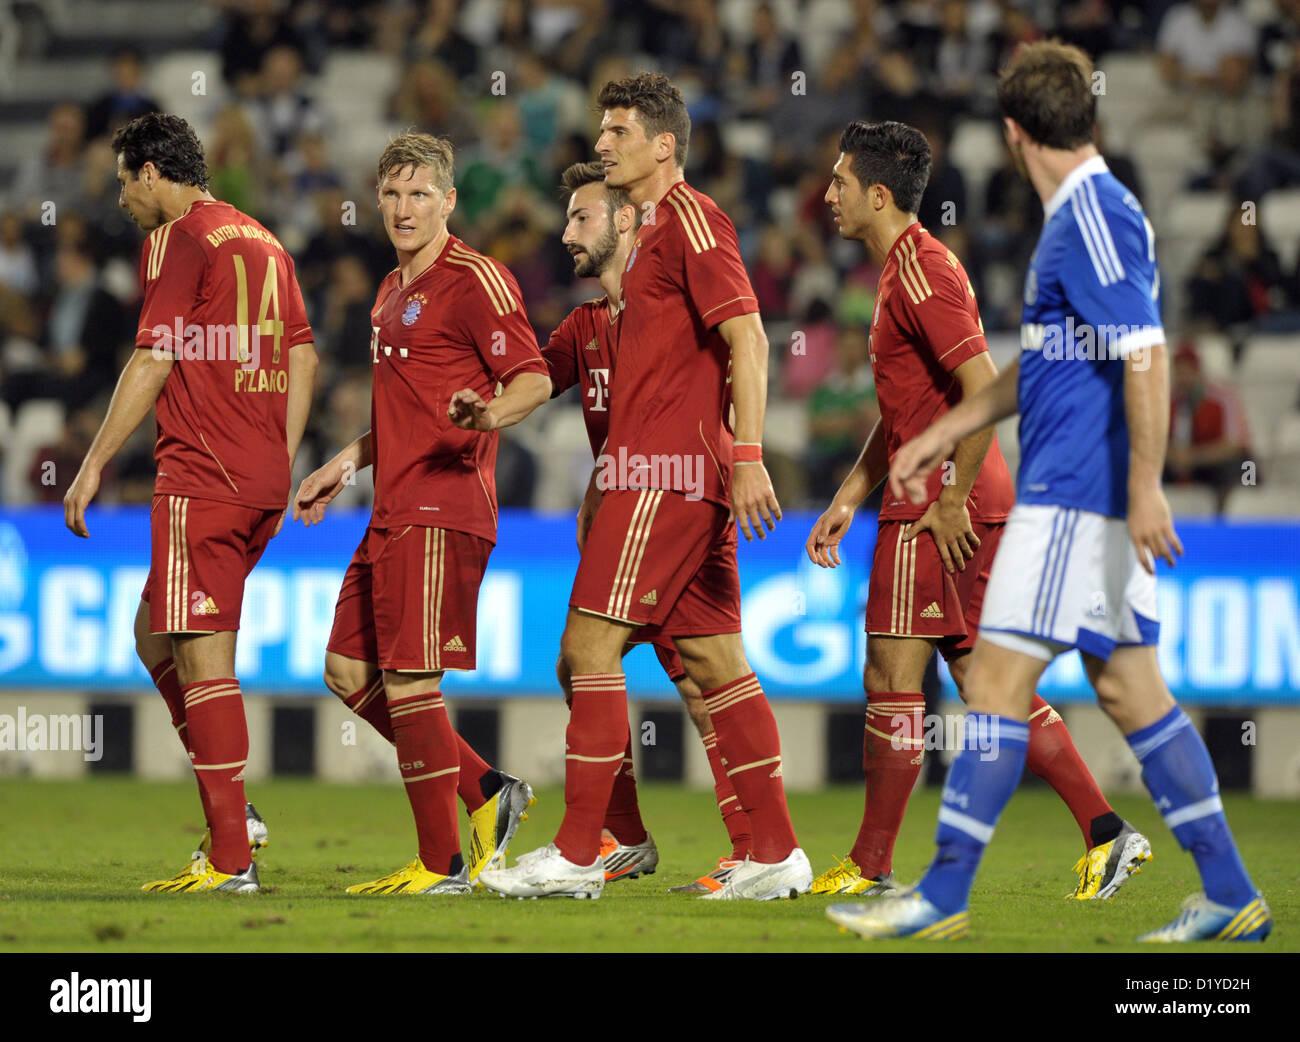 Schalke Christian Fuchs (R) passeggiate passato Monaco di Baviera celebra Claudio Pizarro, Bastian SCHWEINSTEIGER, Immagini Stock